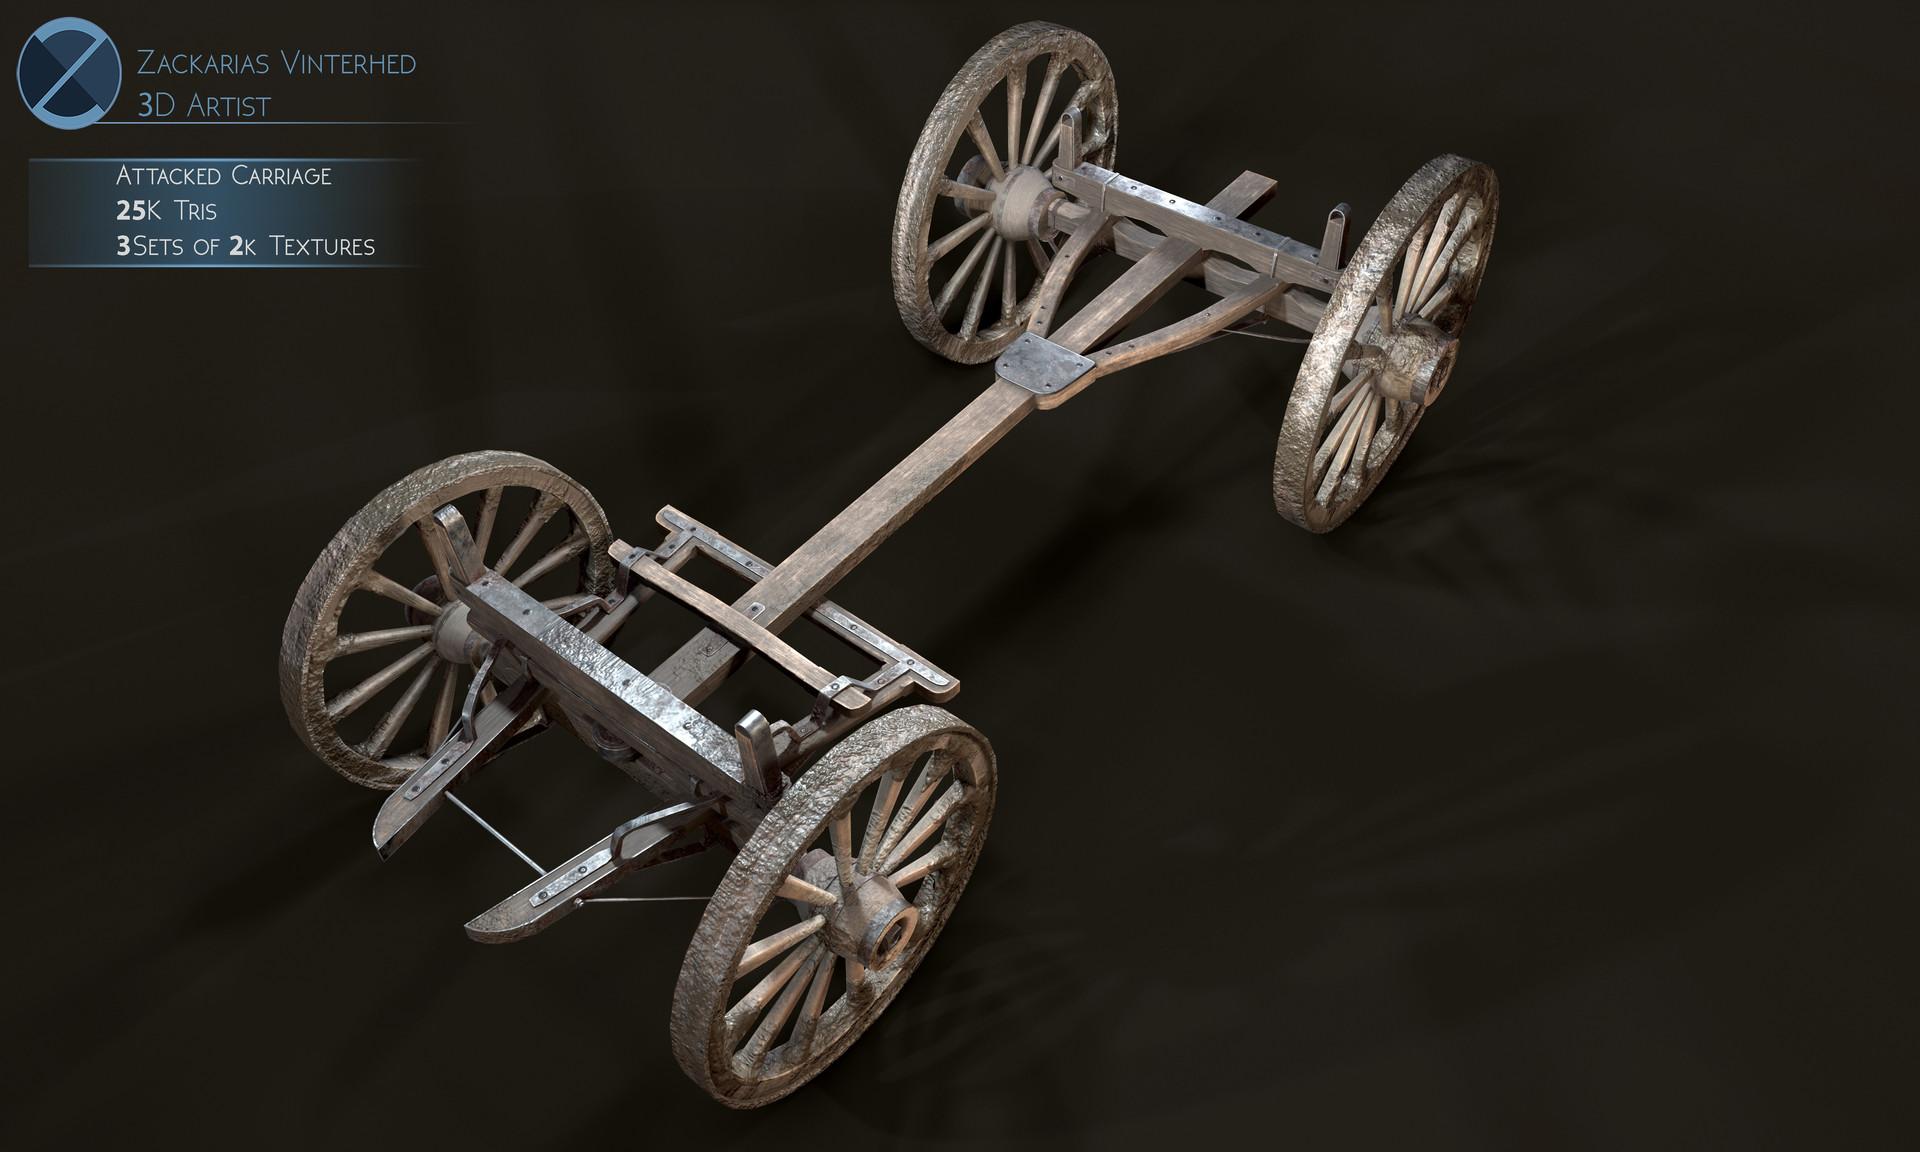 Zackarias vinterhed carriage 06